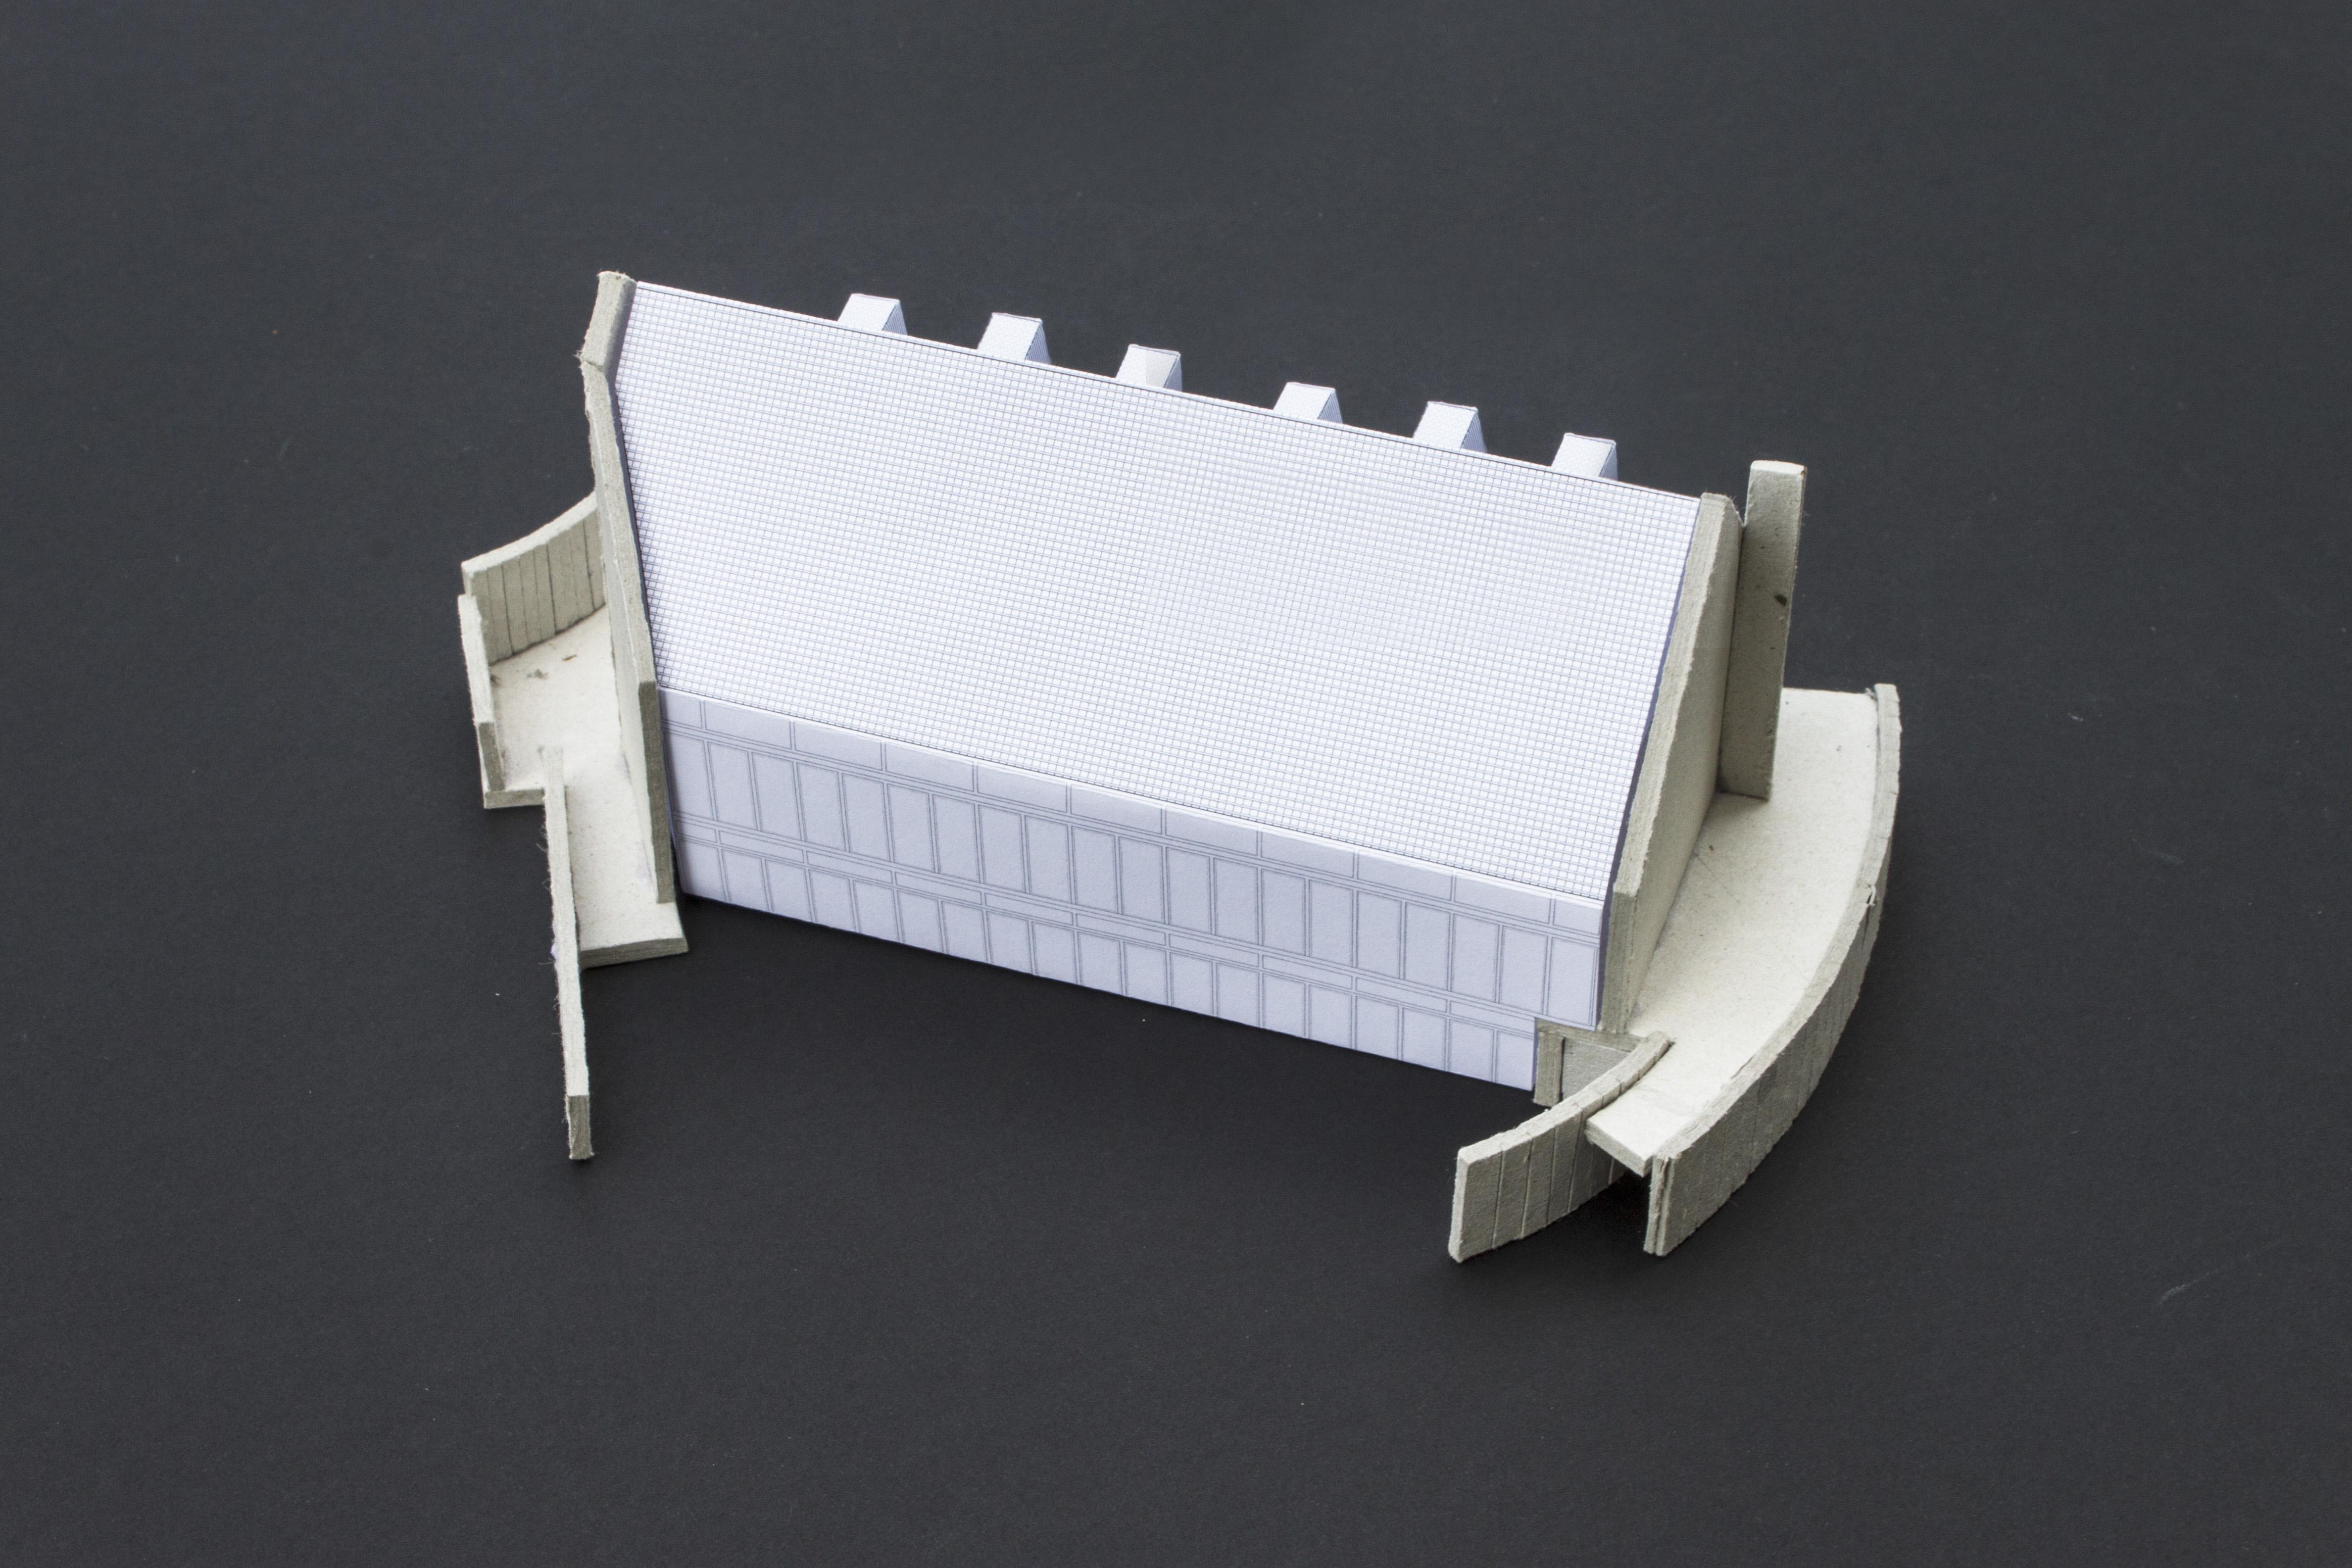 Konzeptmodell